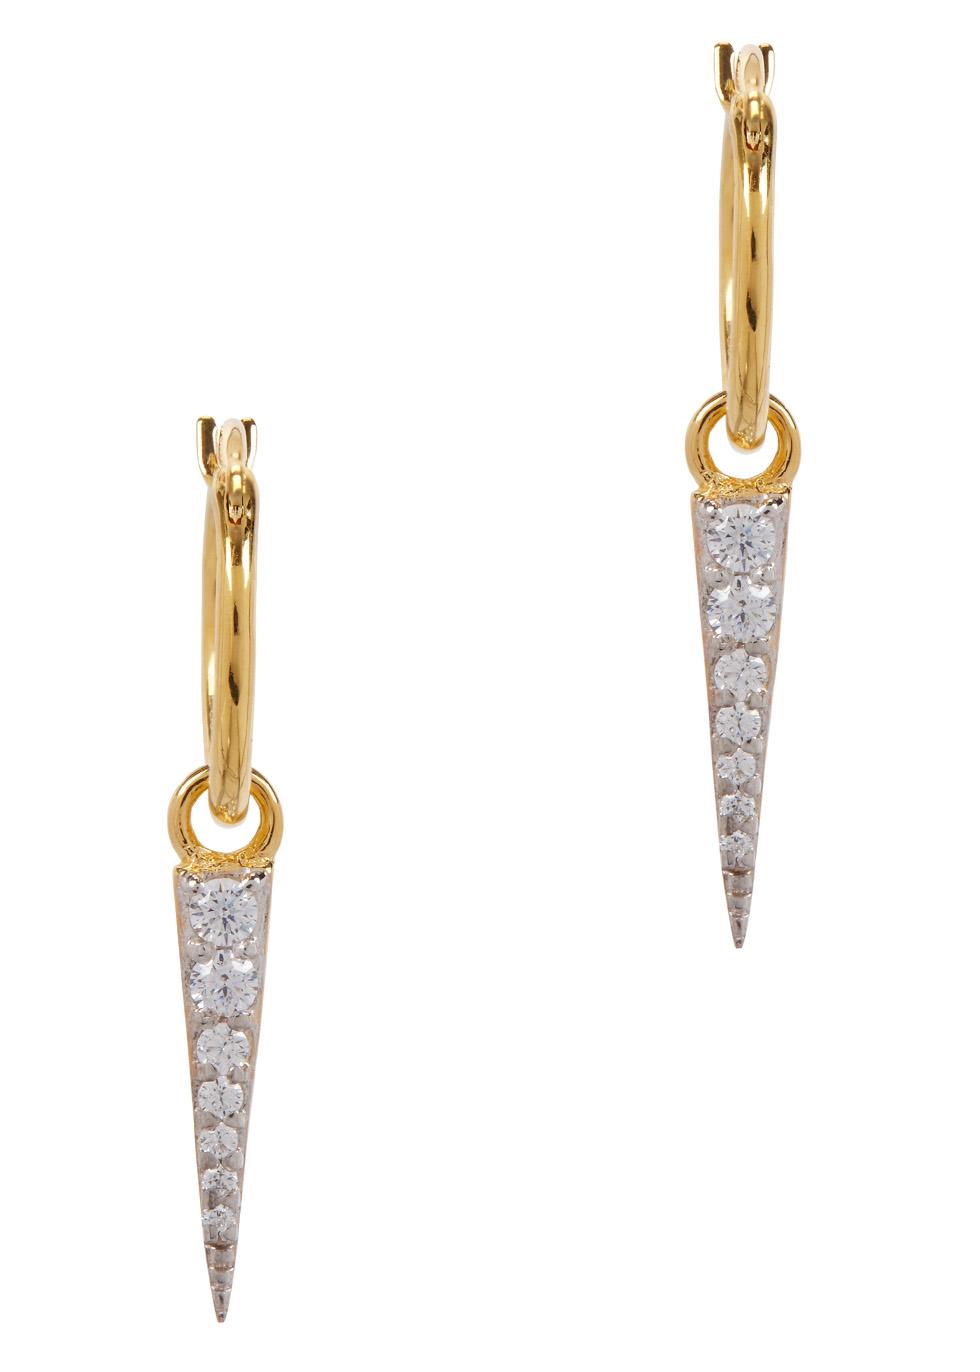 Mini Dagger 18ct gold-plated earrings